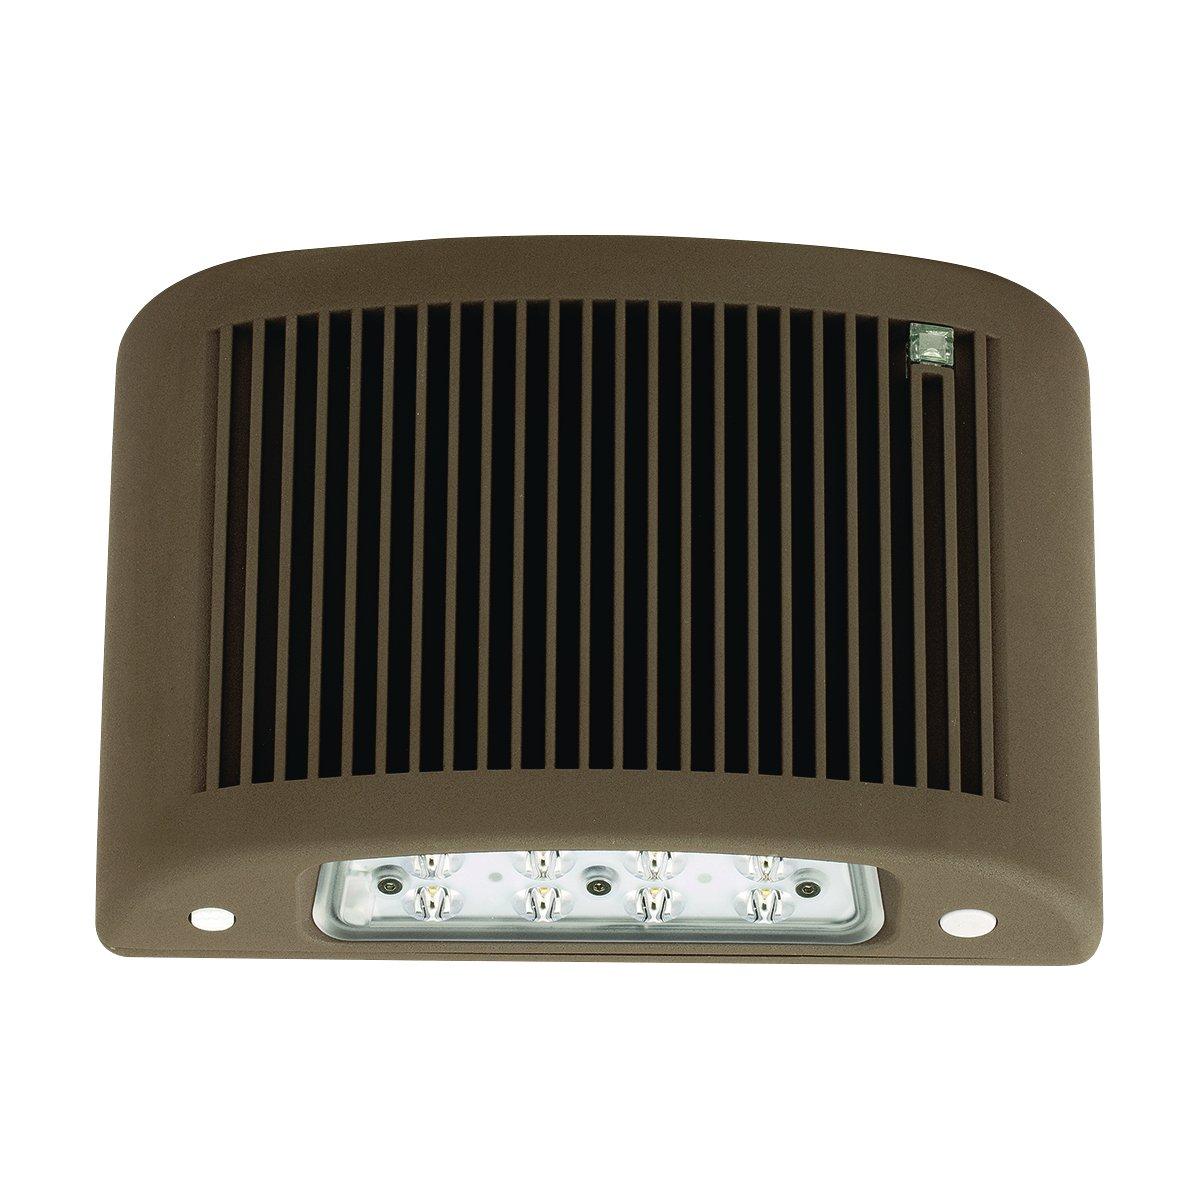 Compass CUSO4DB-H-ND CUSO Series Slim LED AC//Emergency Outdoor LightA tradeSELECT Product Dark Bronze